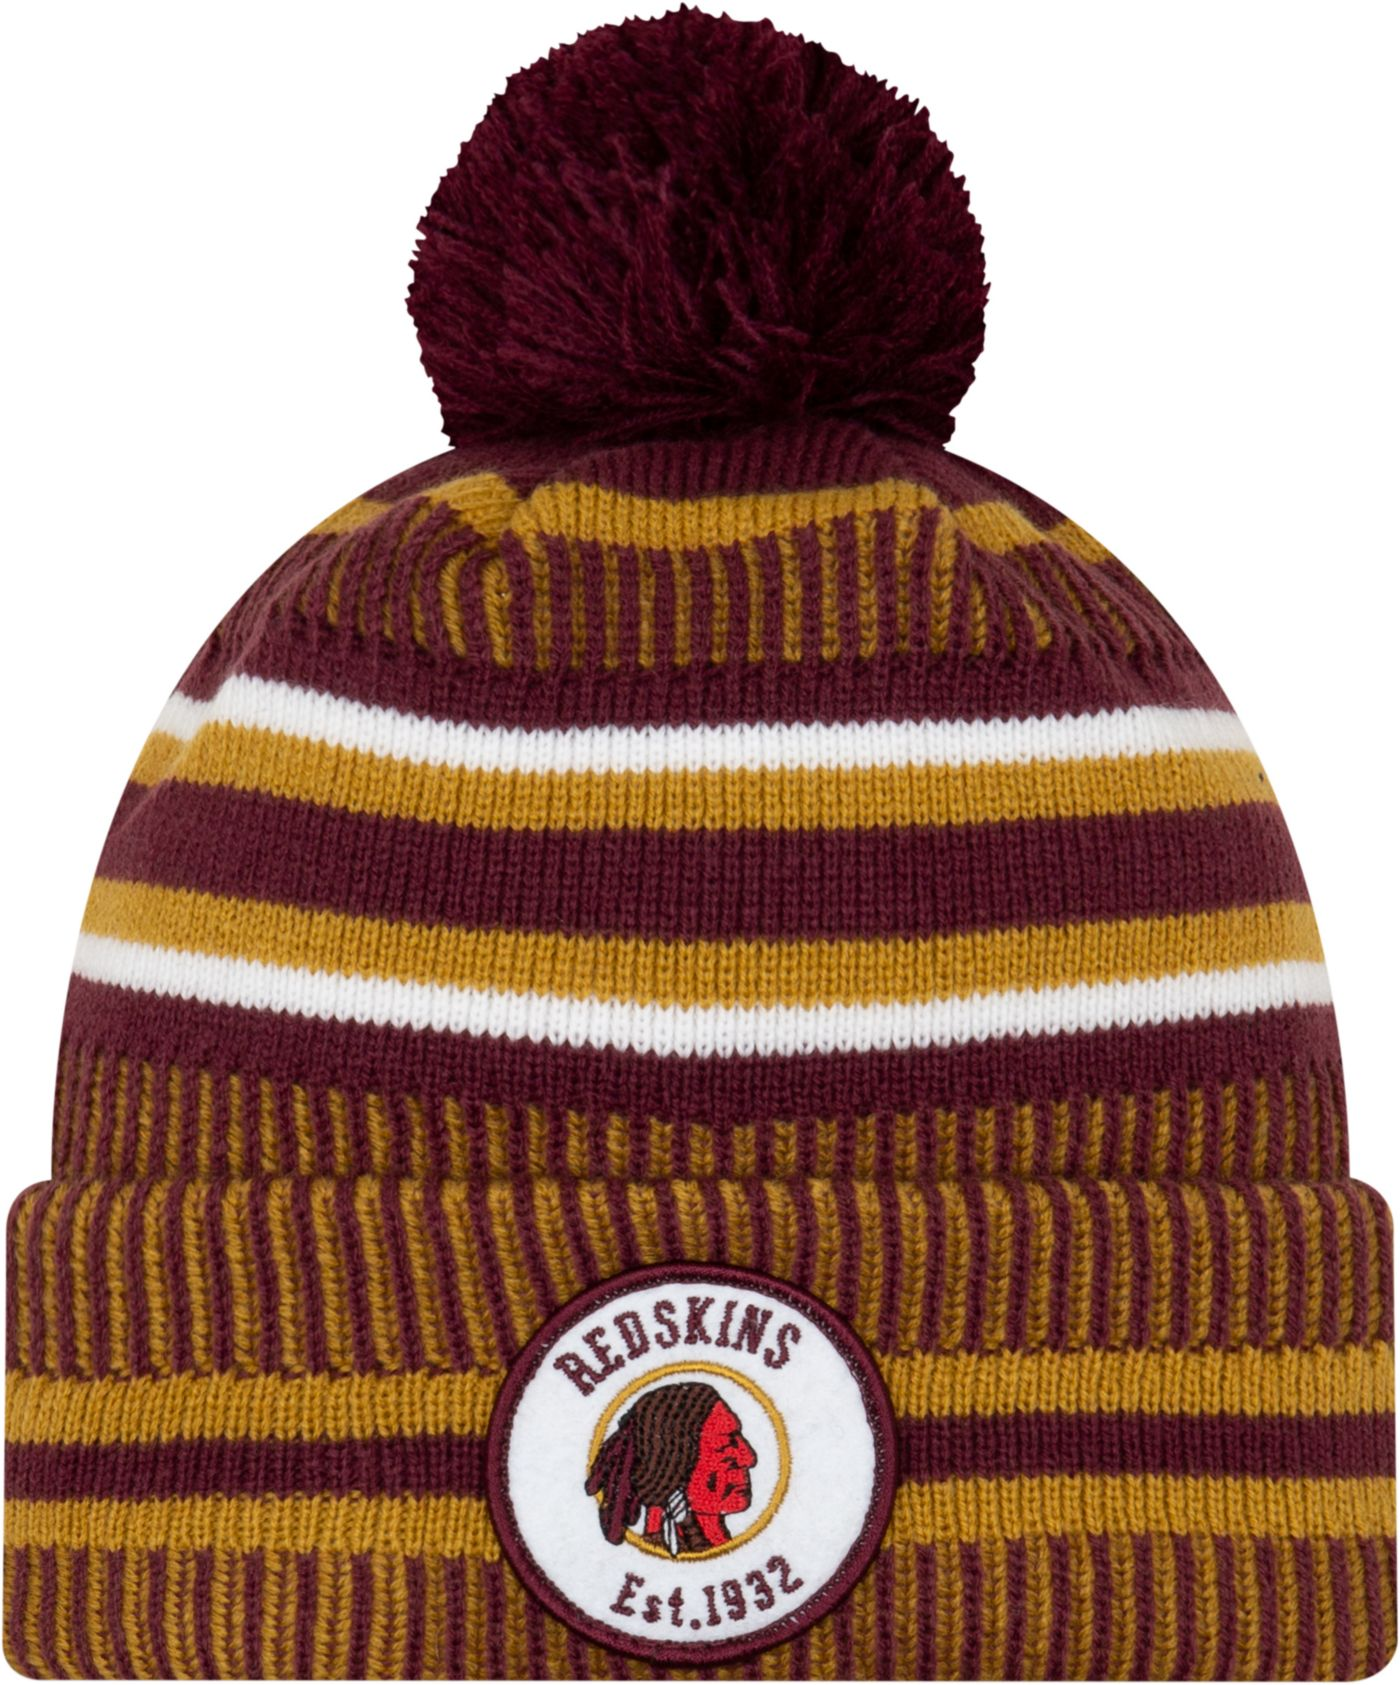 New Era Men's Washington Redskins Sideline Home Sport Pom Knit